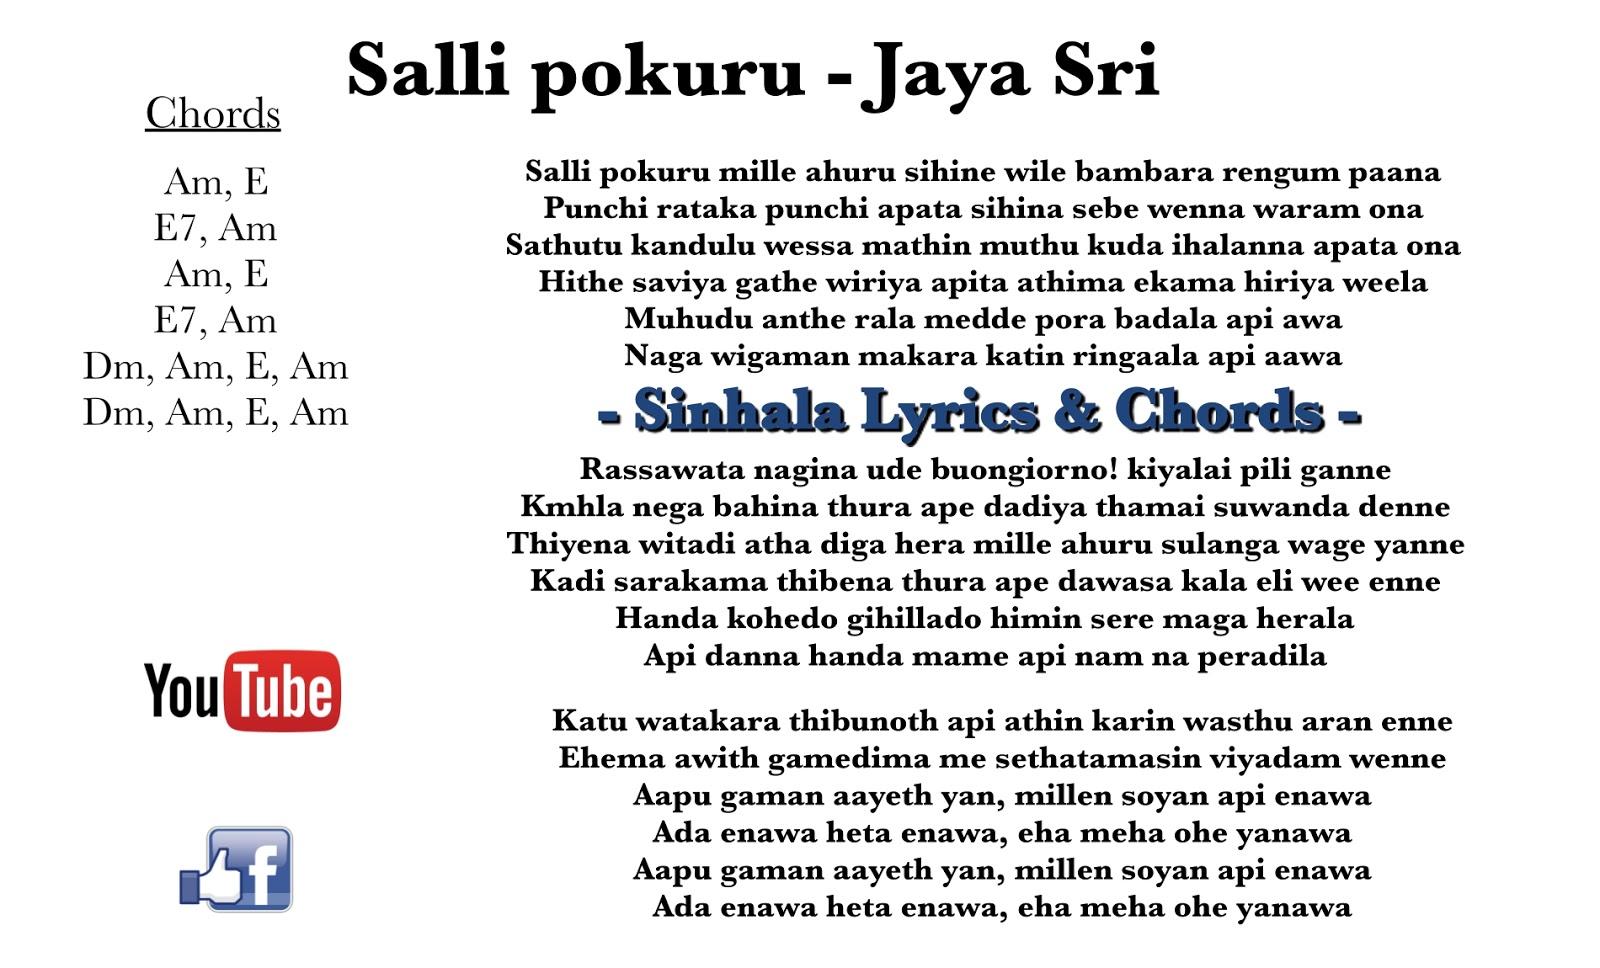 Sinhala Lyrics Chords And Karaoke Salli Pokuru Jaya Sri Lyrics